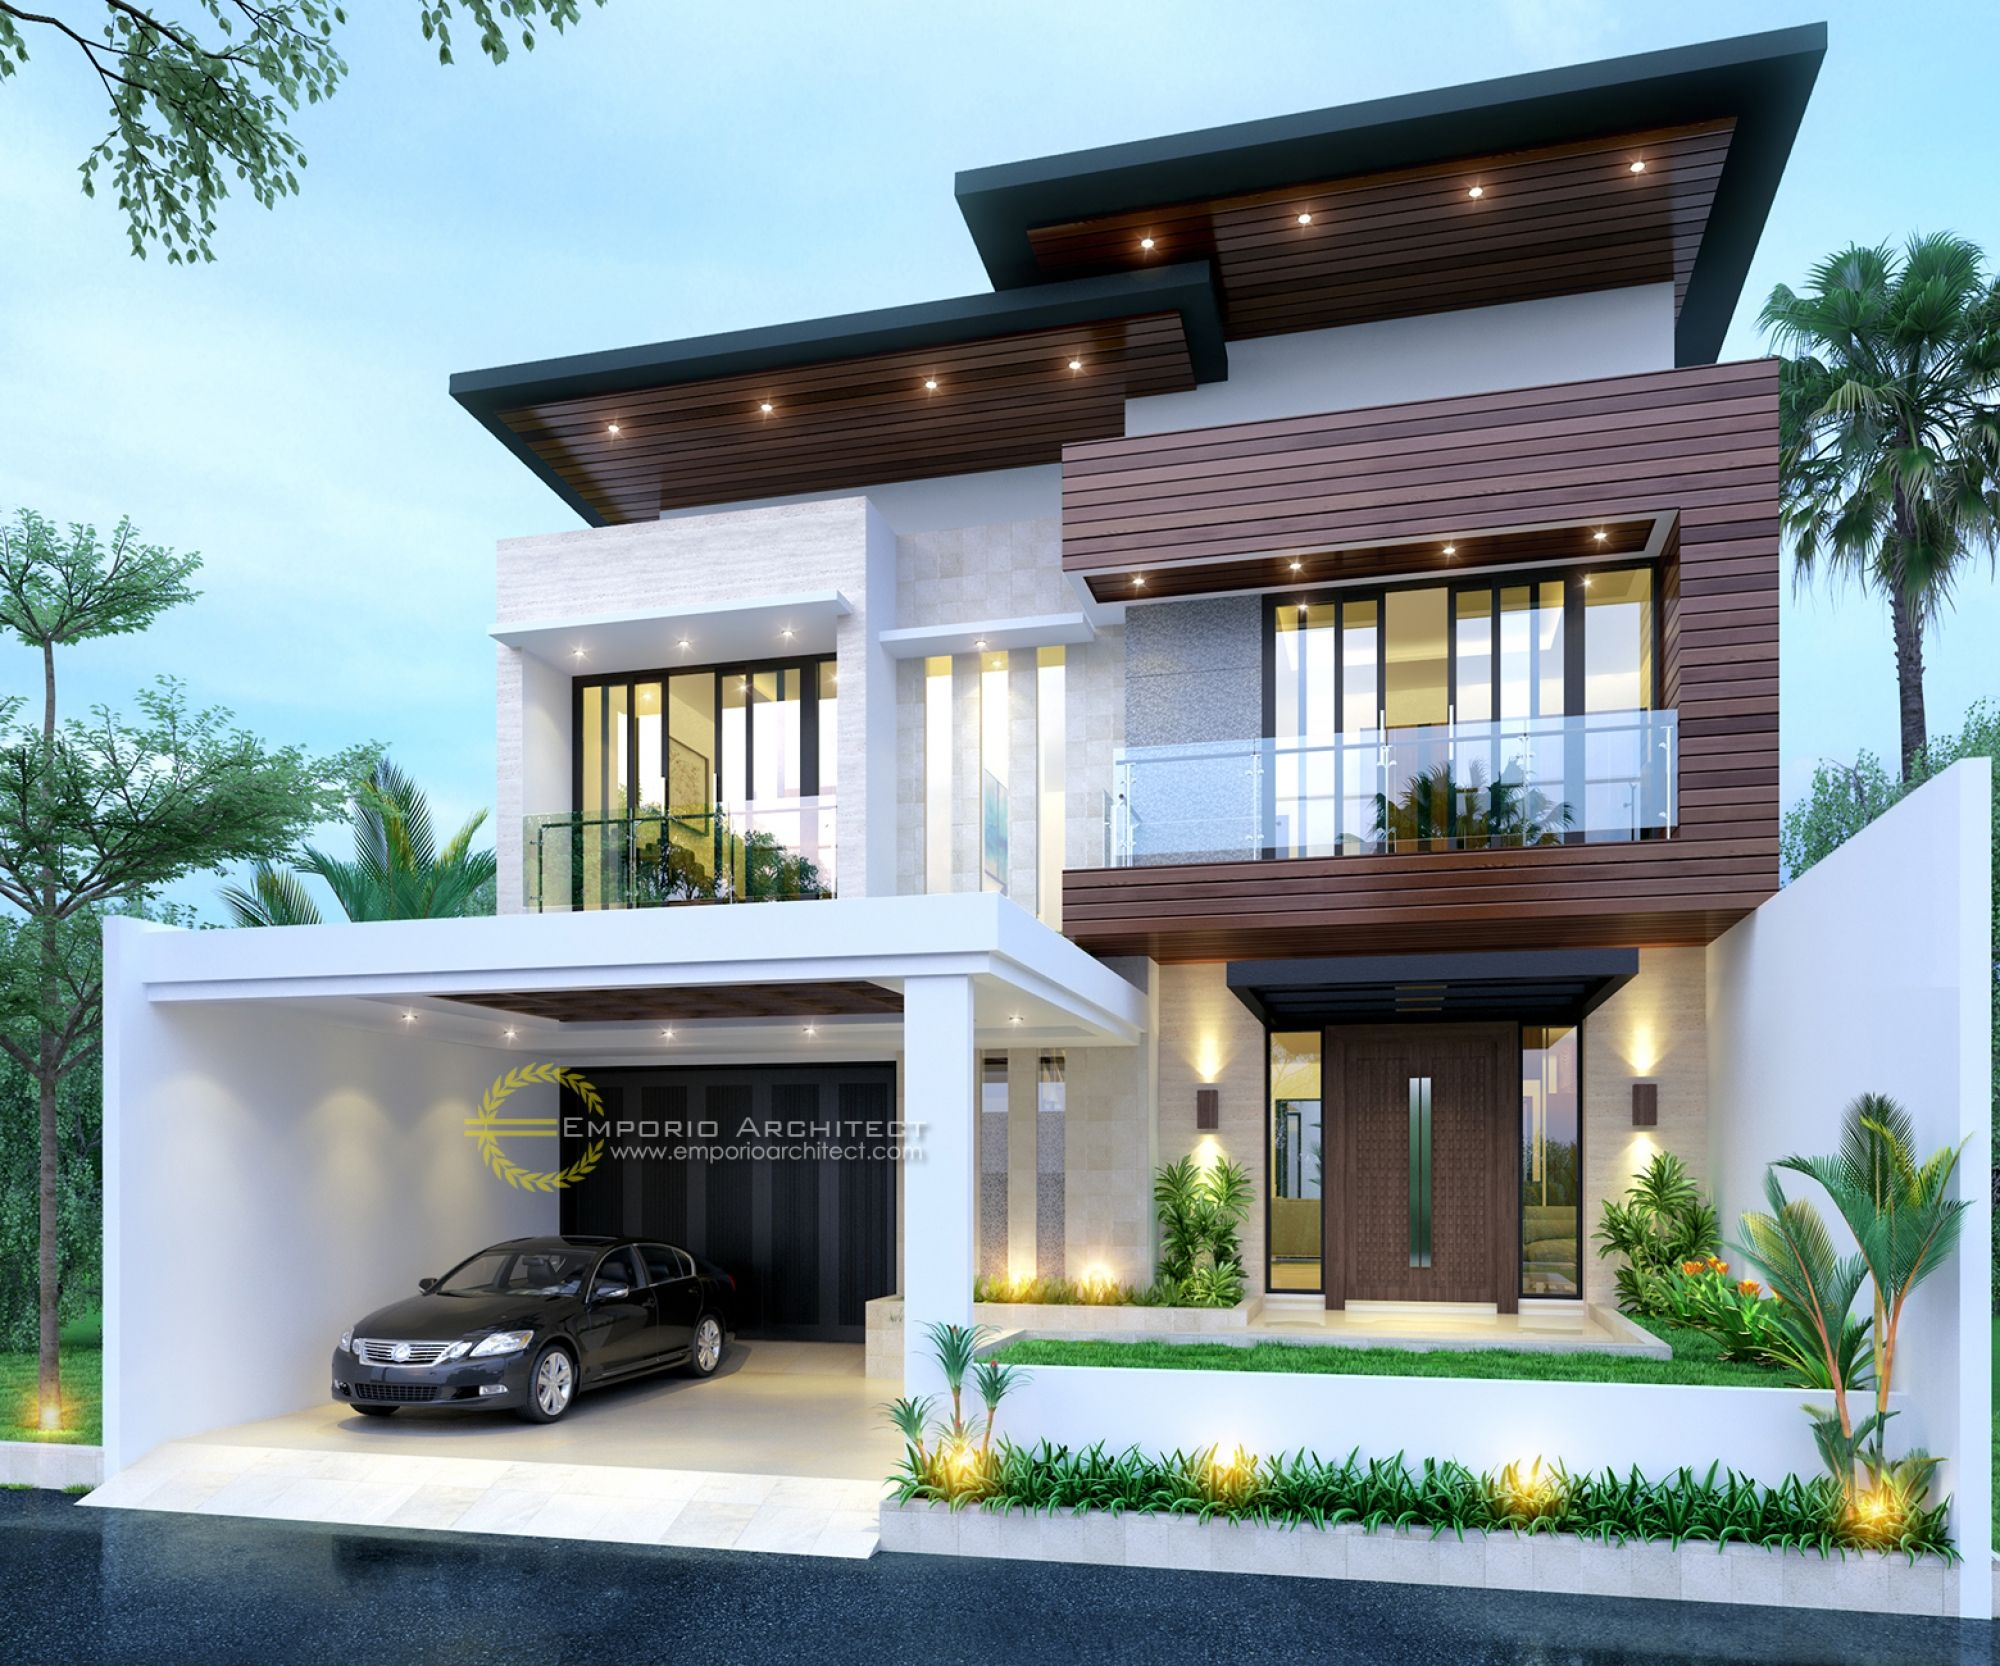 Jasa arsitek jatibening bekasi desain rumah ibu anisa also house exterior plans india hiqra kerala design rh pinterest